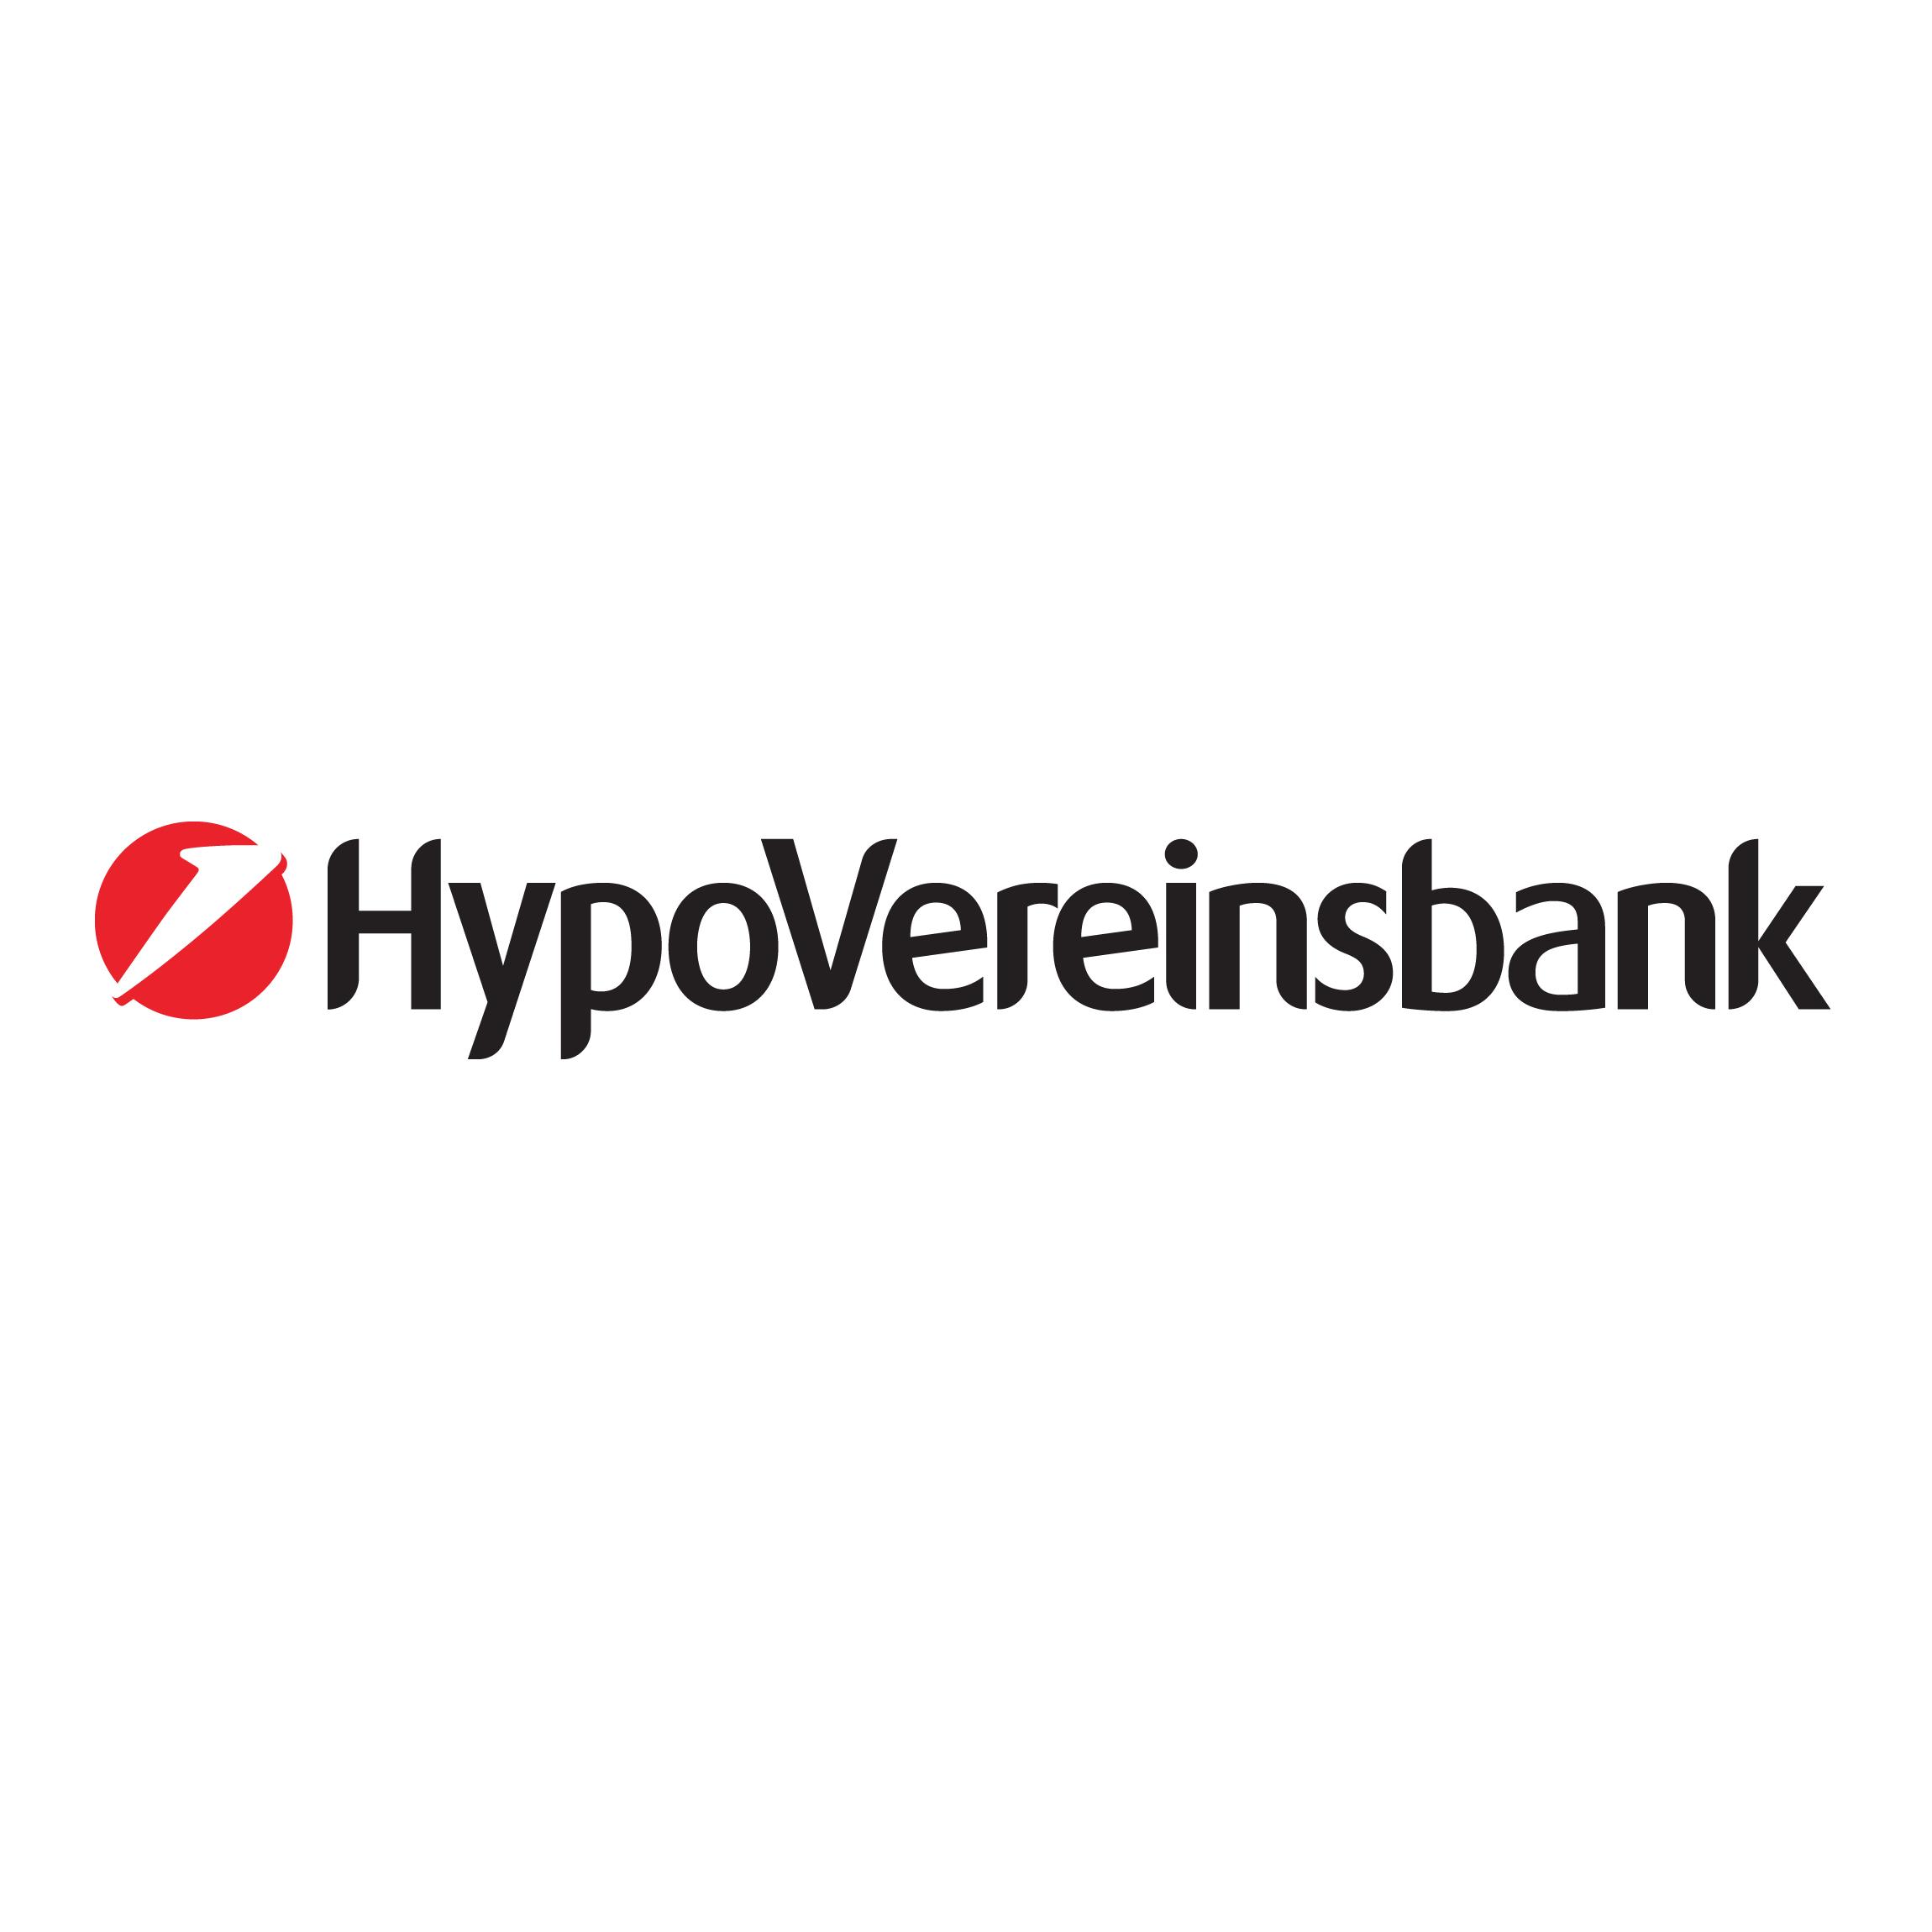 HypoVereinsbank Regensburg Prinz Luitpold